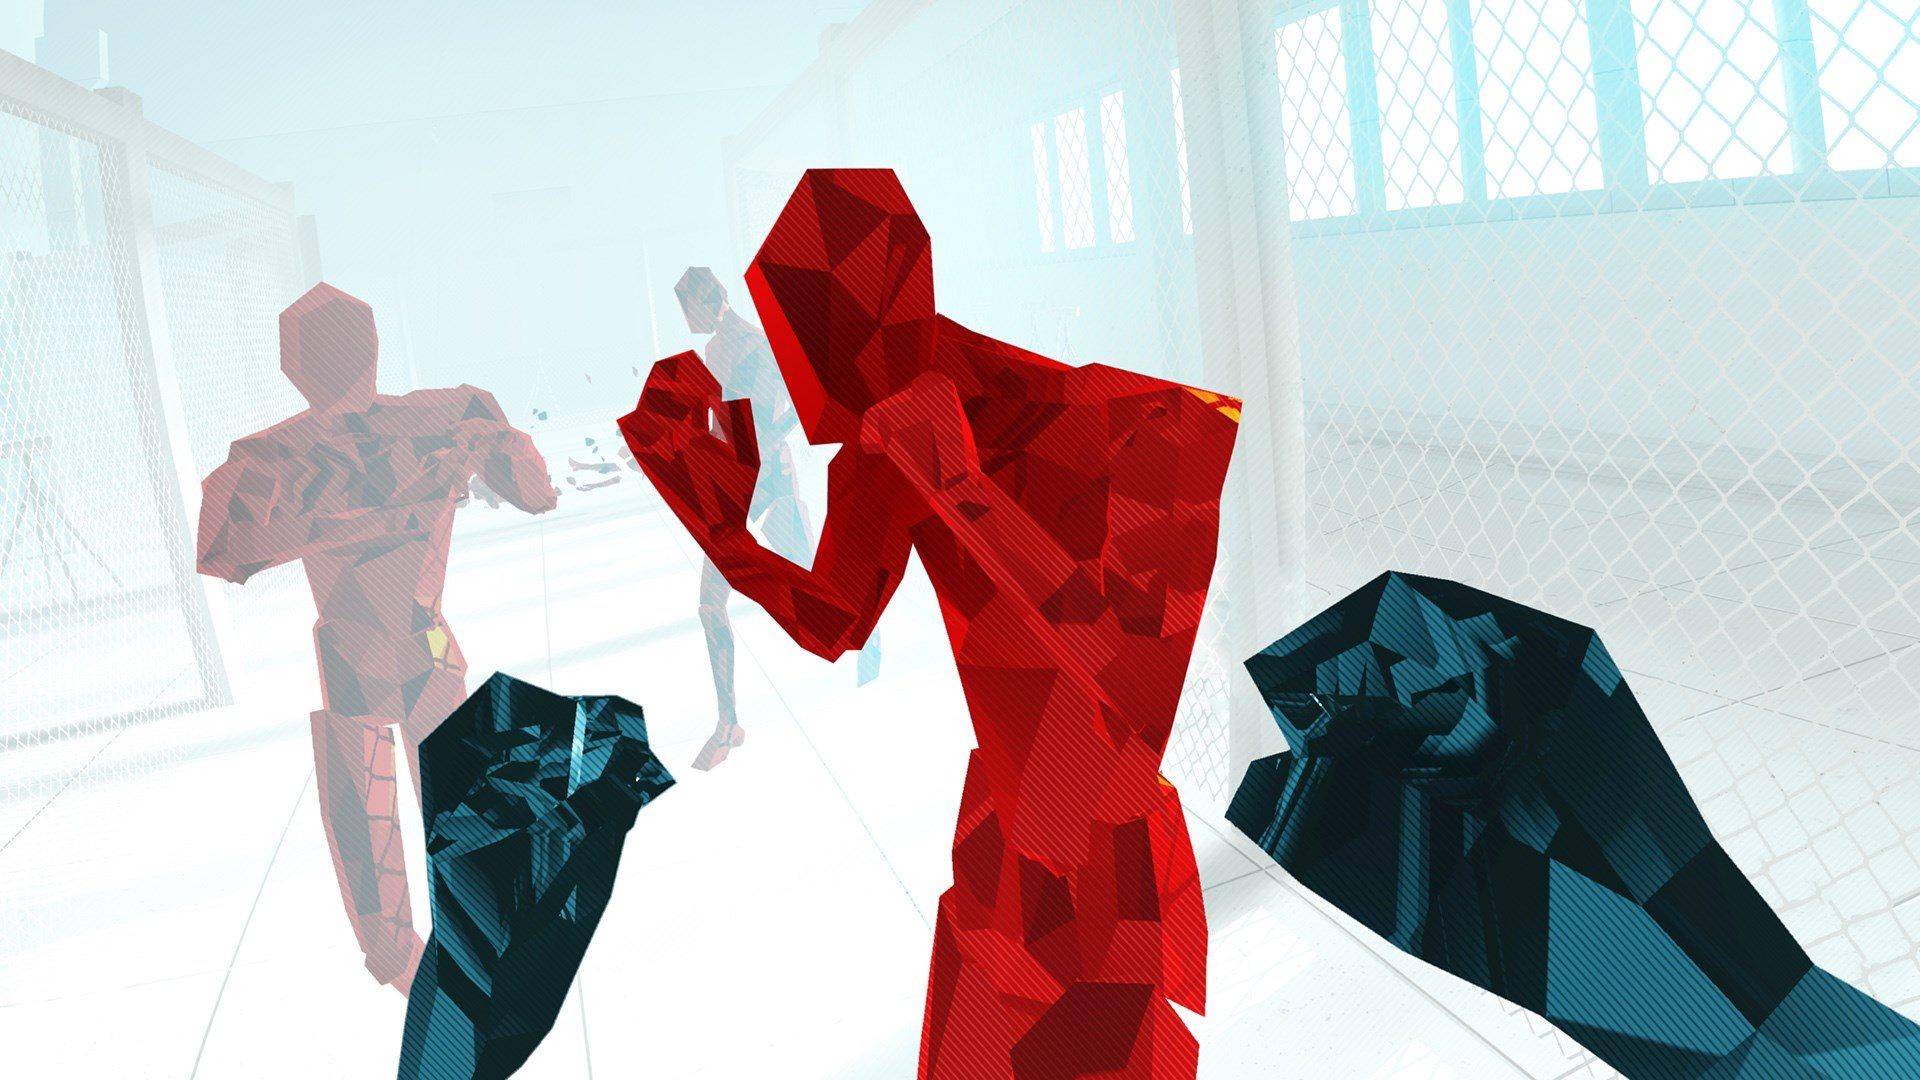 Red, polygonal enemies meet your fists in Superhot VR